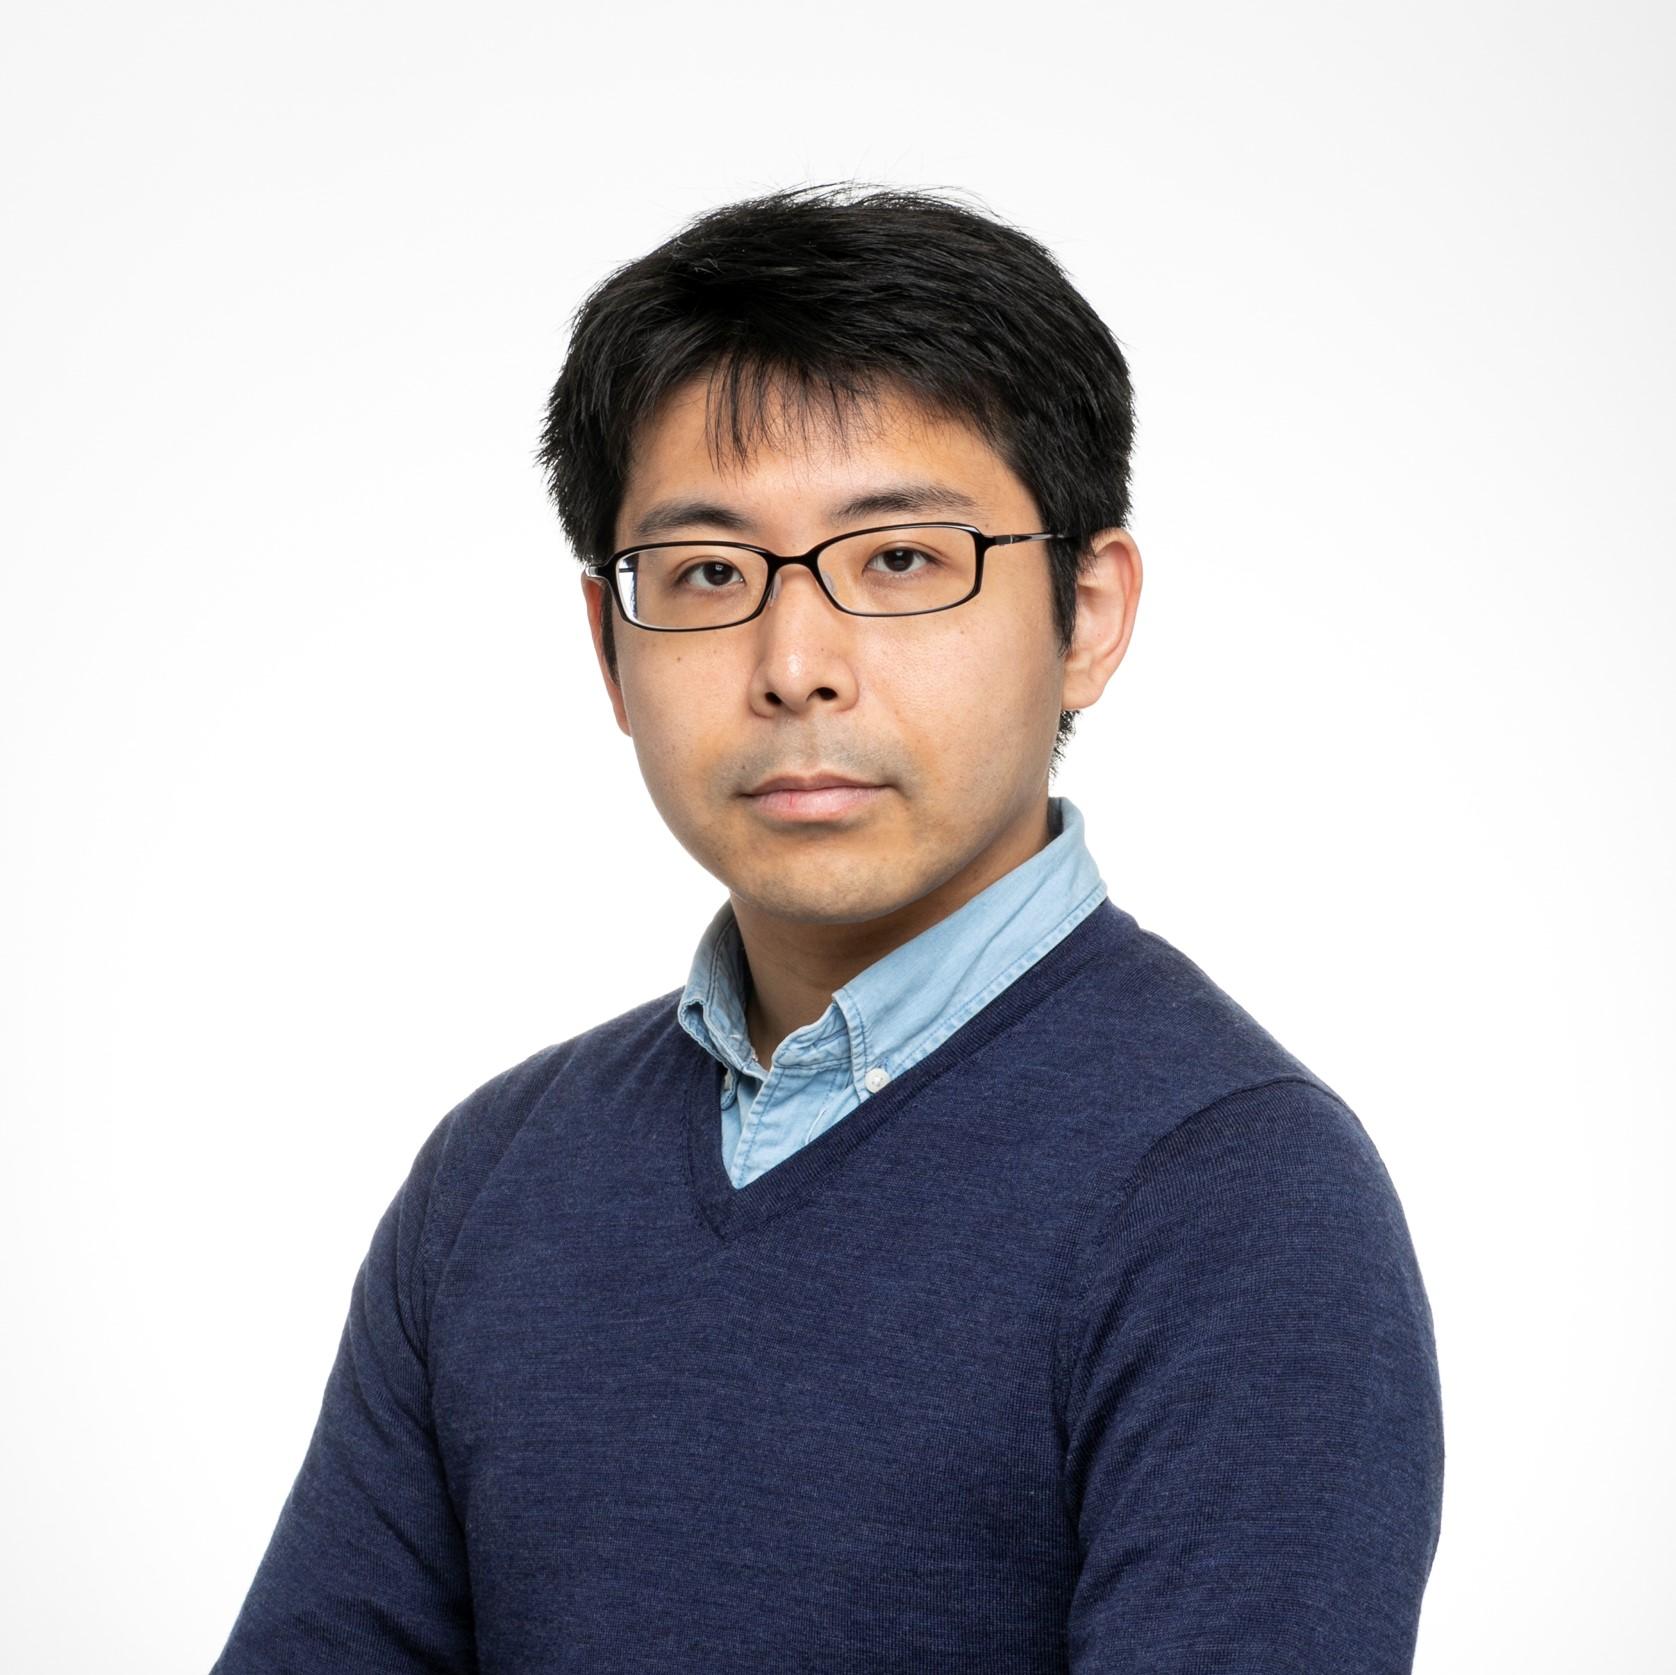 Kei Fujiyama